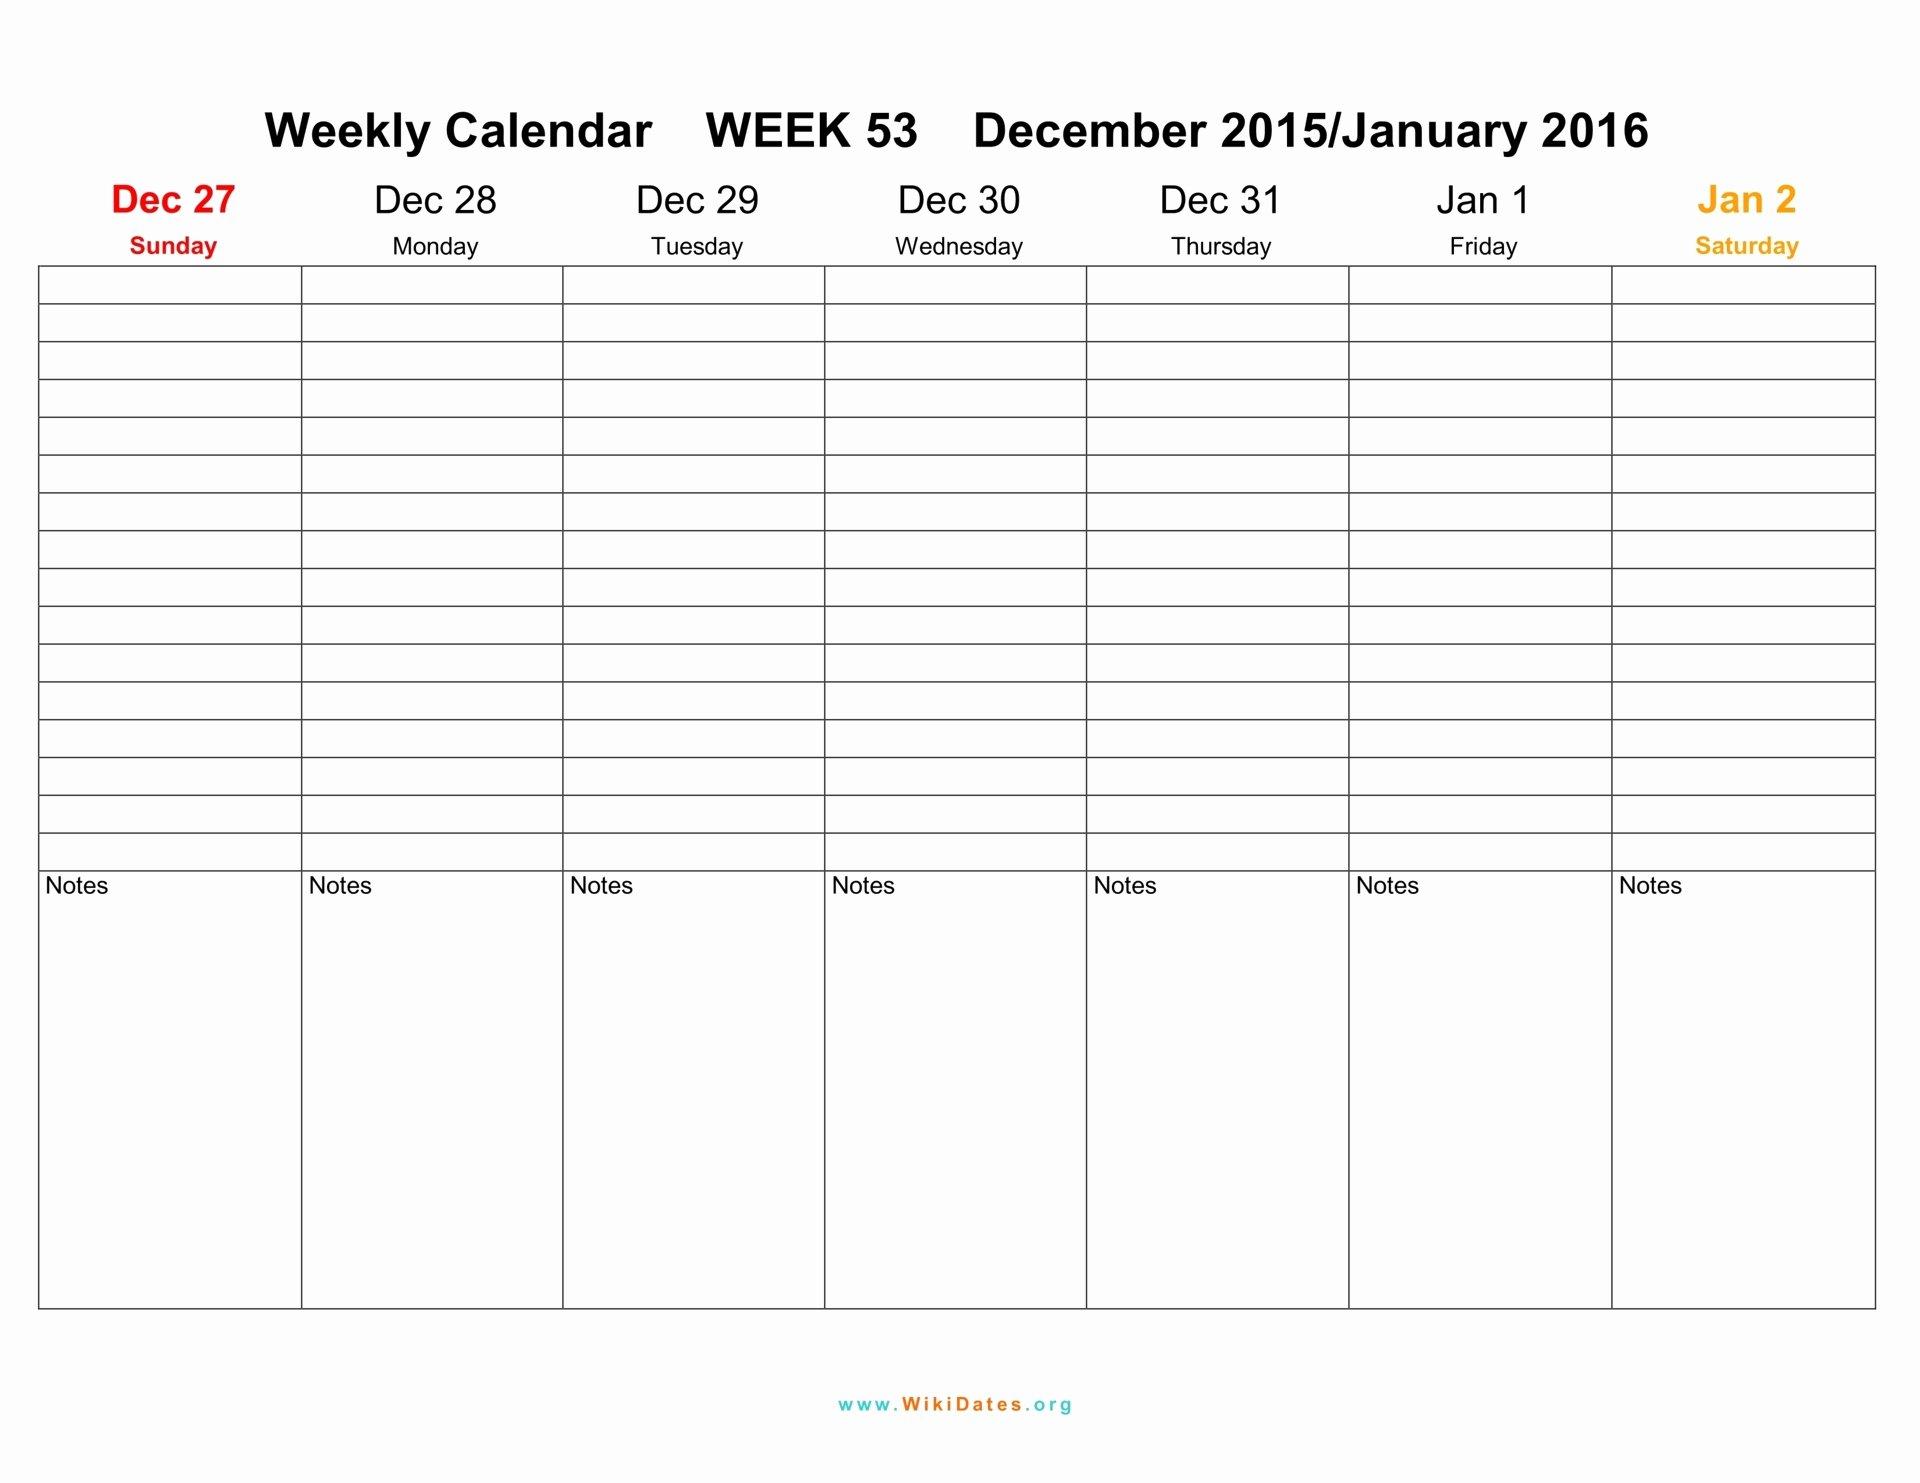 Weekly Calendar Template 2017 Beautiful Weekly Calendar 2016 2017 2018